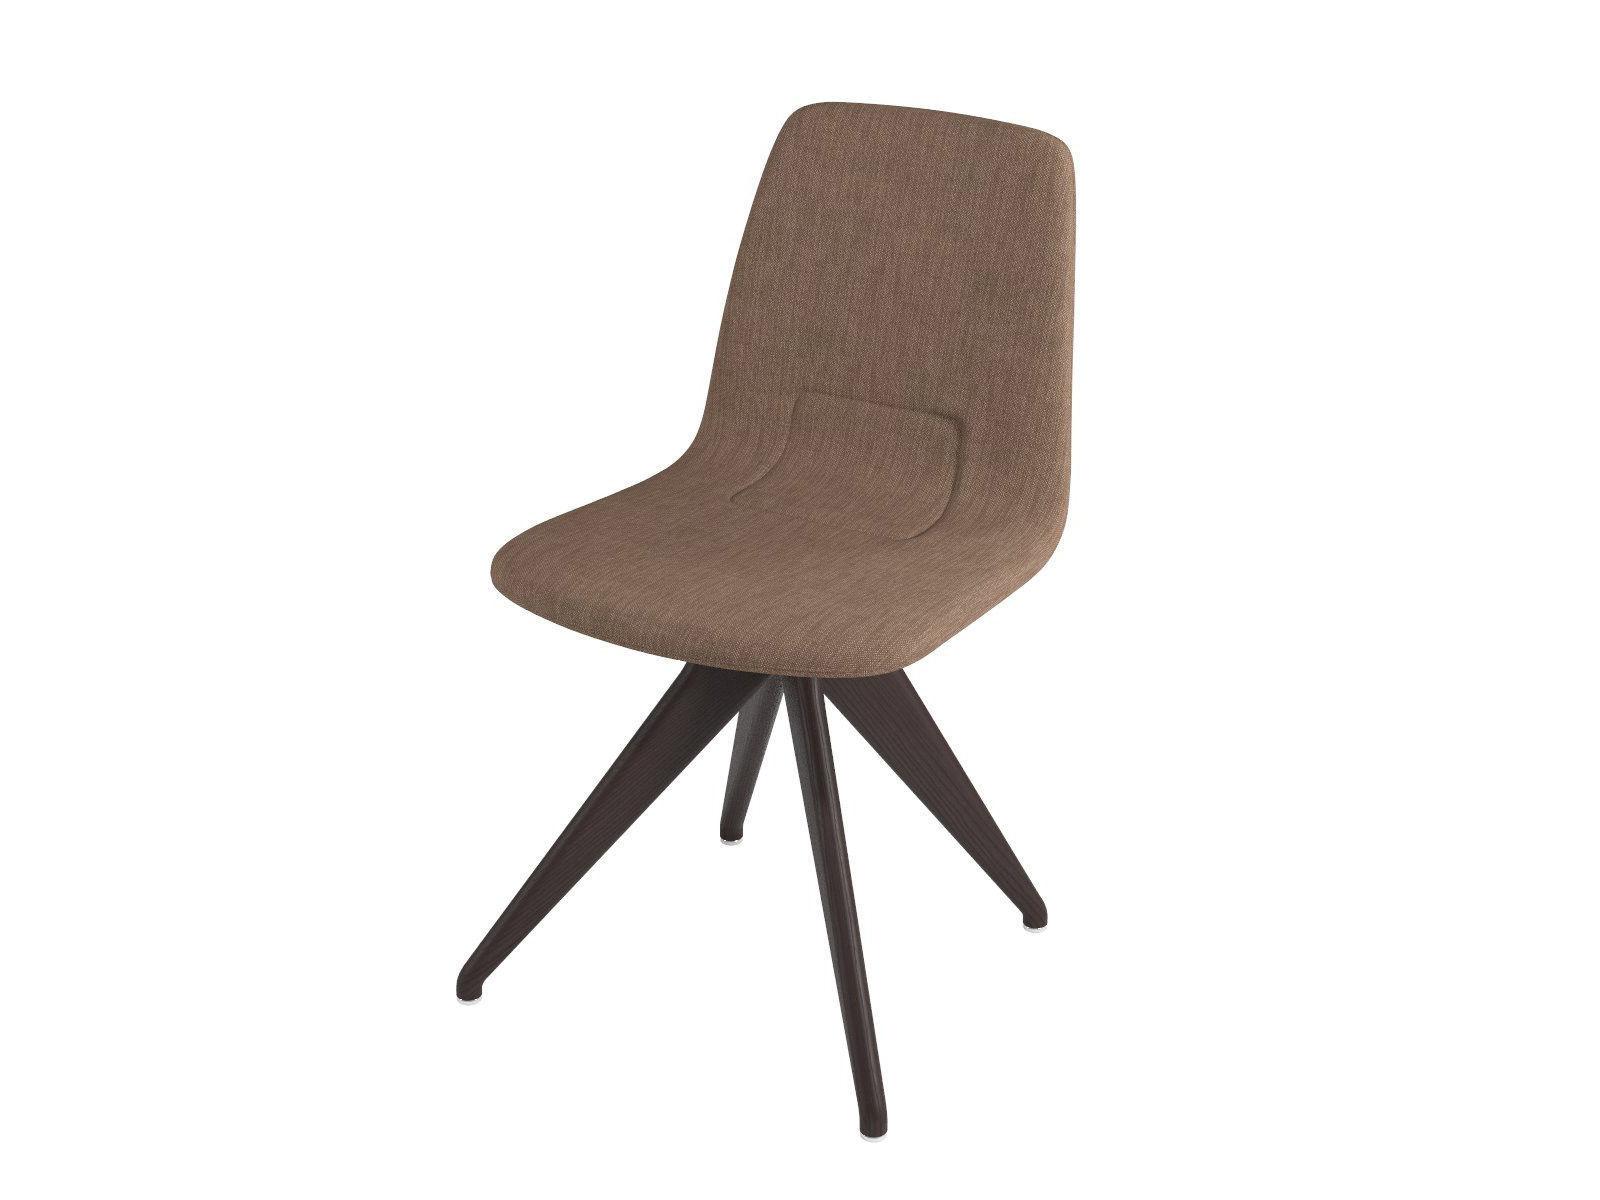 Chair TORSO 837-I POTOCCO Brown linen and dark brown ash